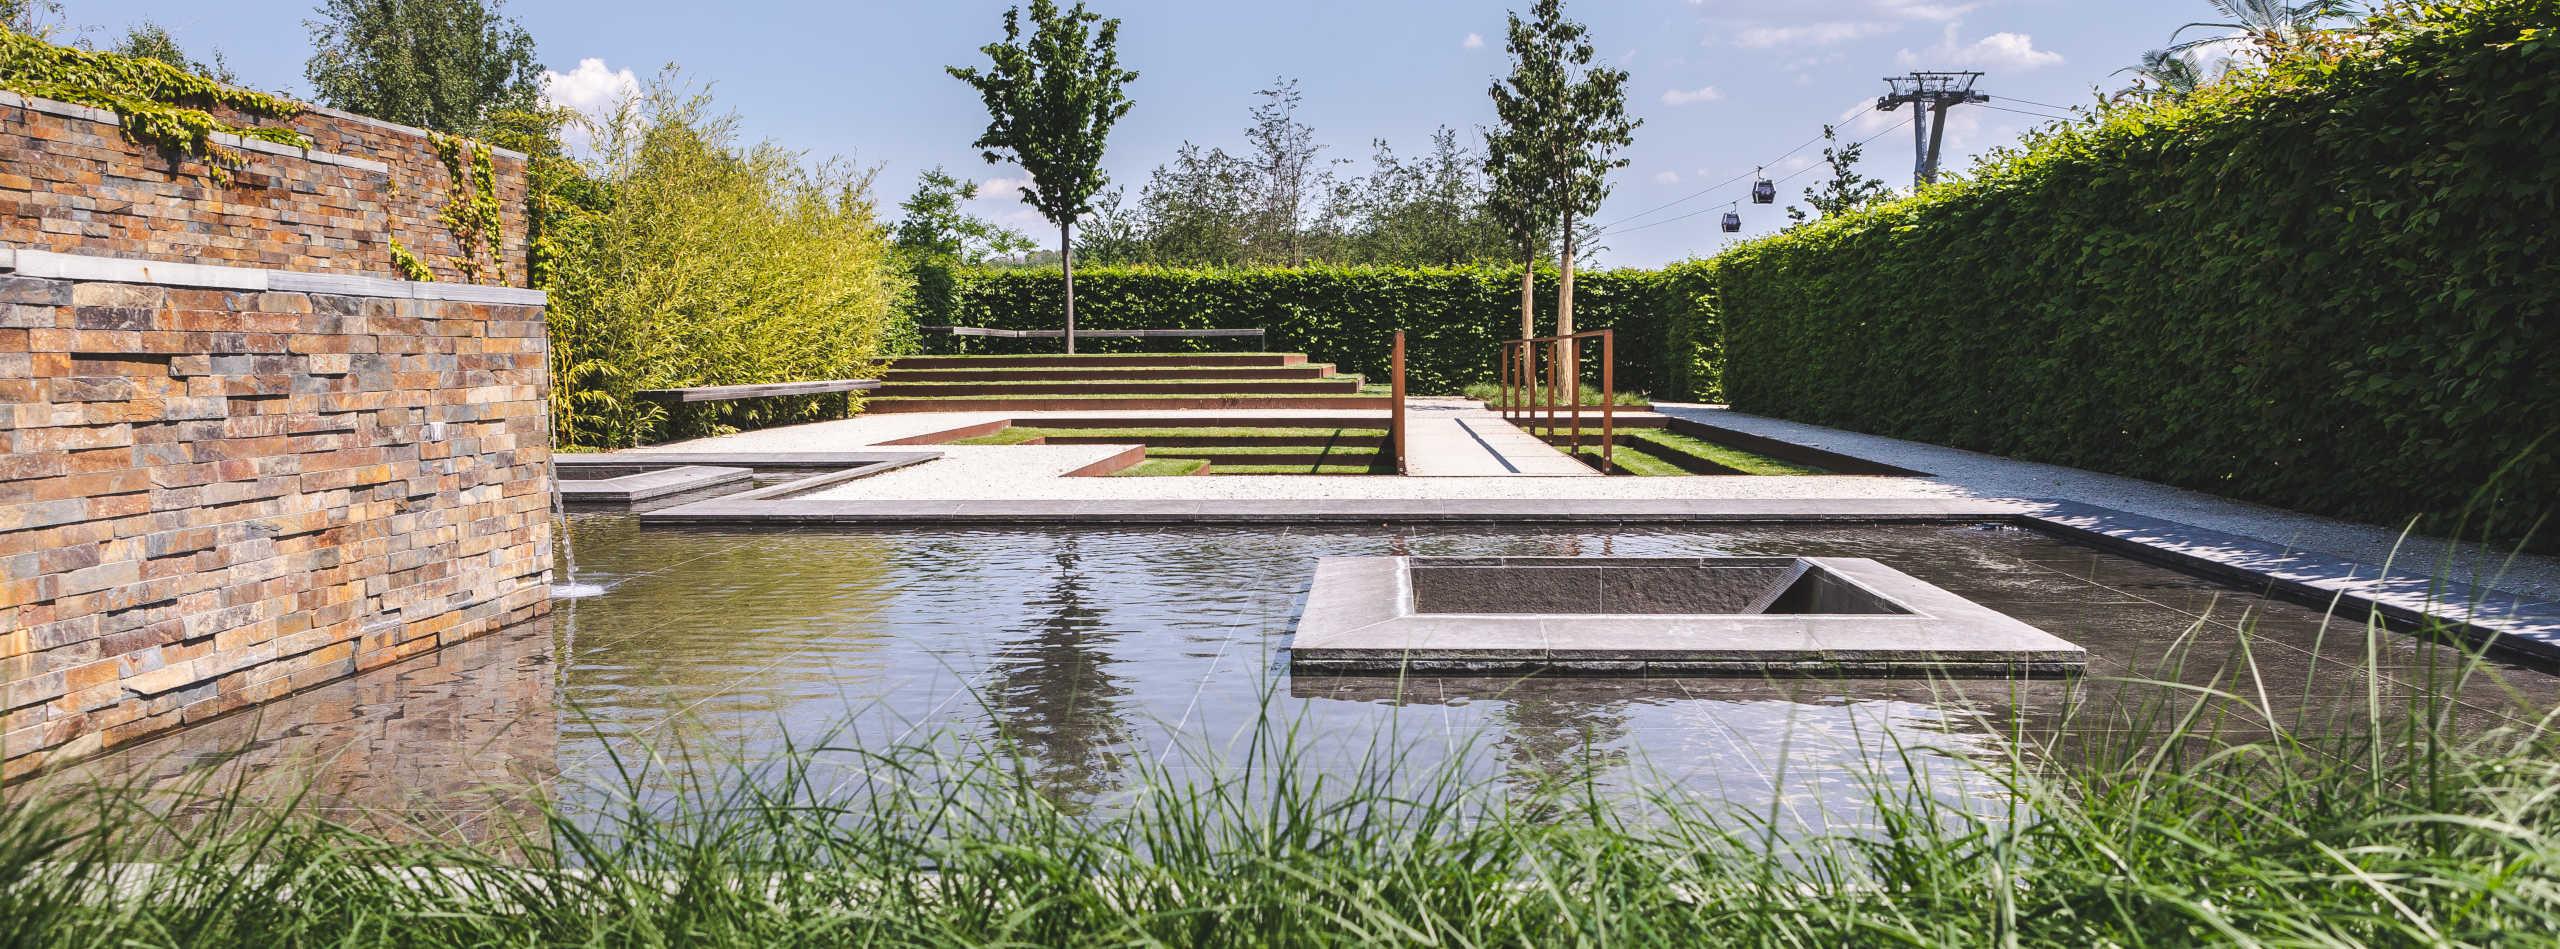 Garten Der Welt Marzahn Hellersdorf